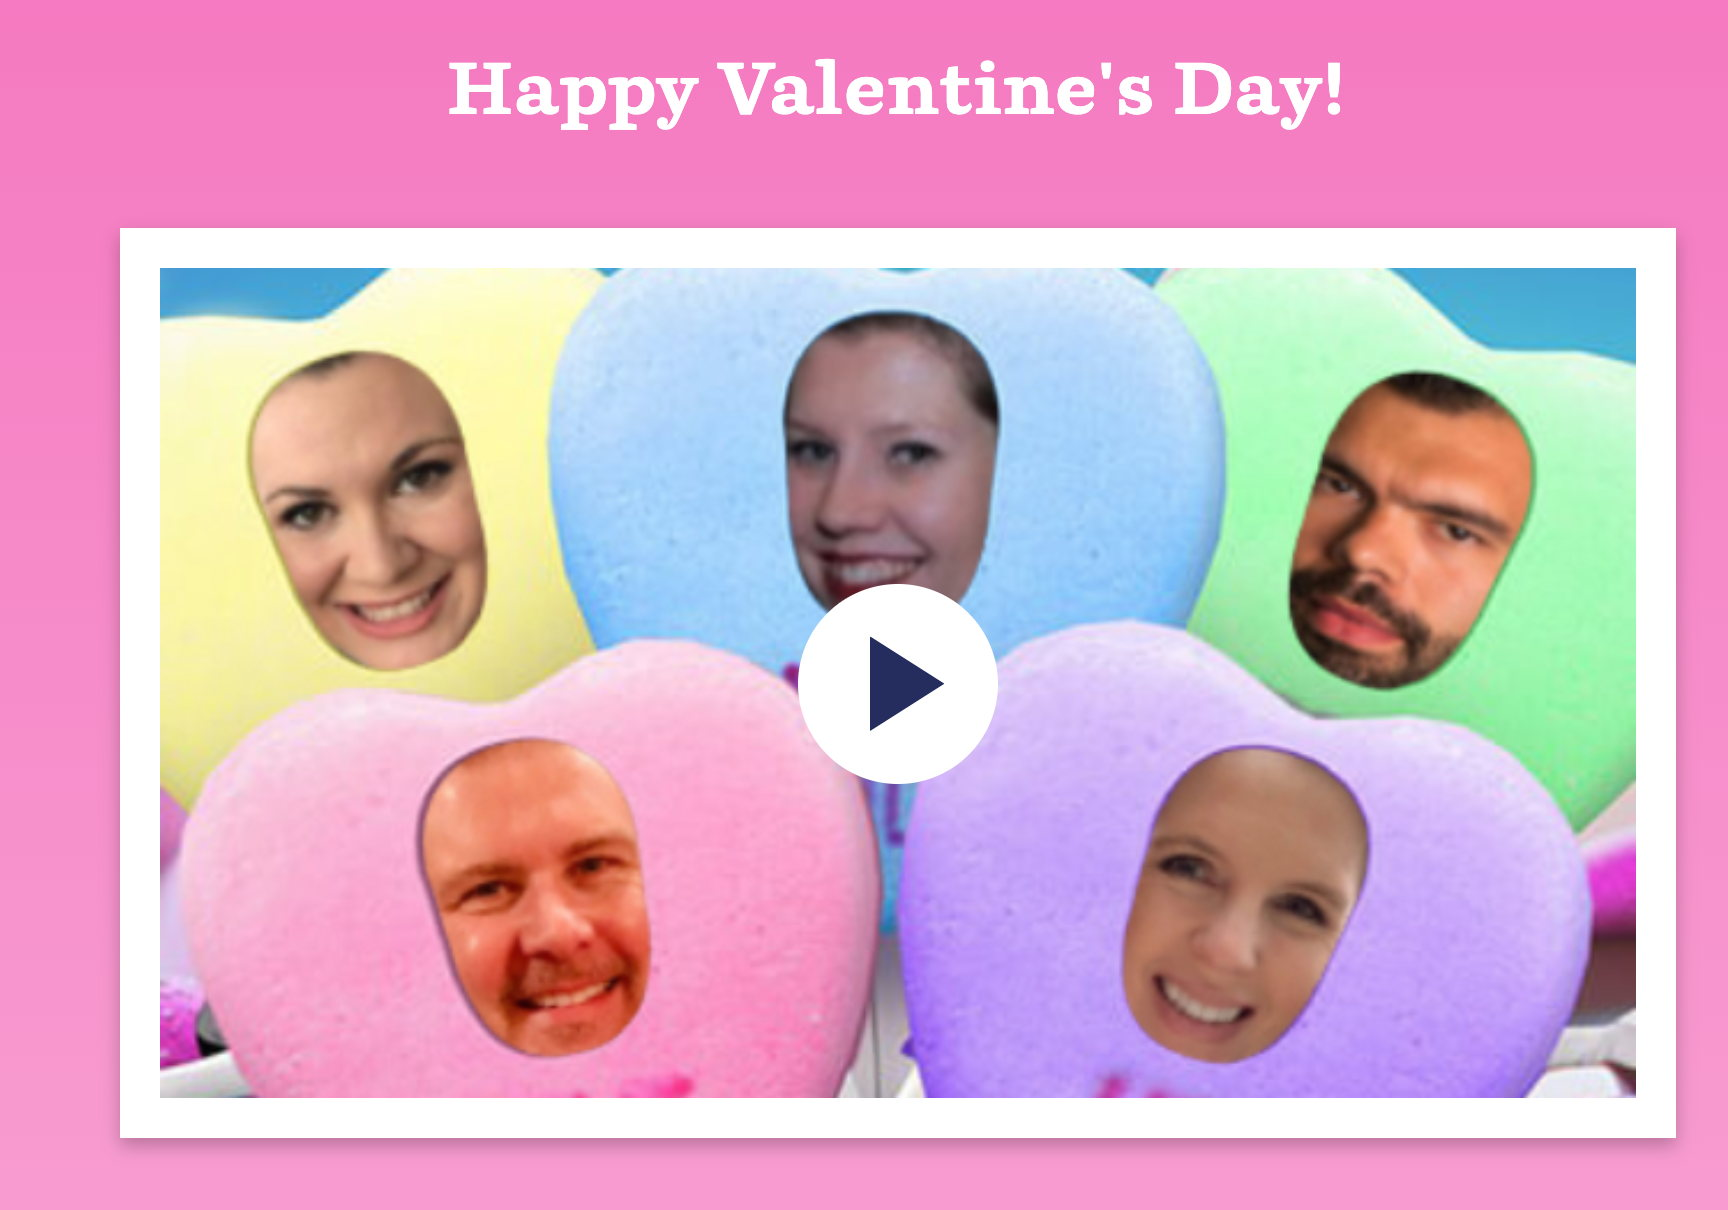 Happy Valentine's Day from Mojo Leadership